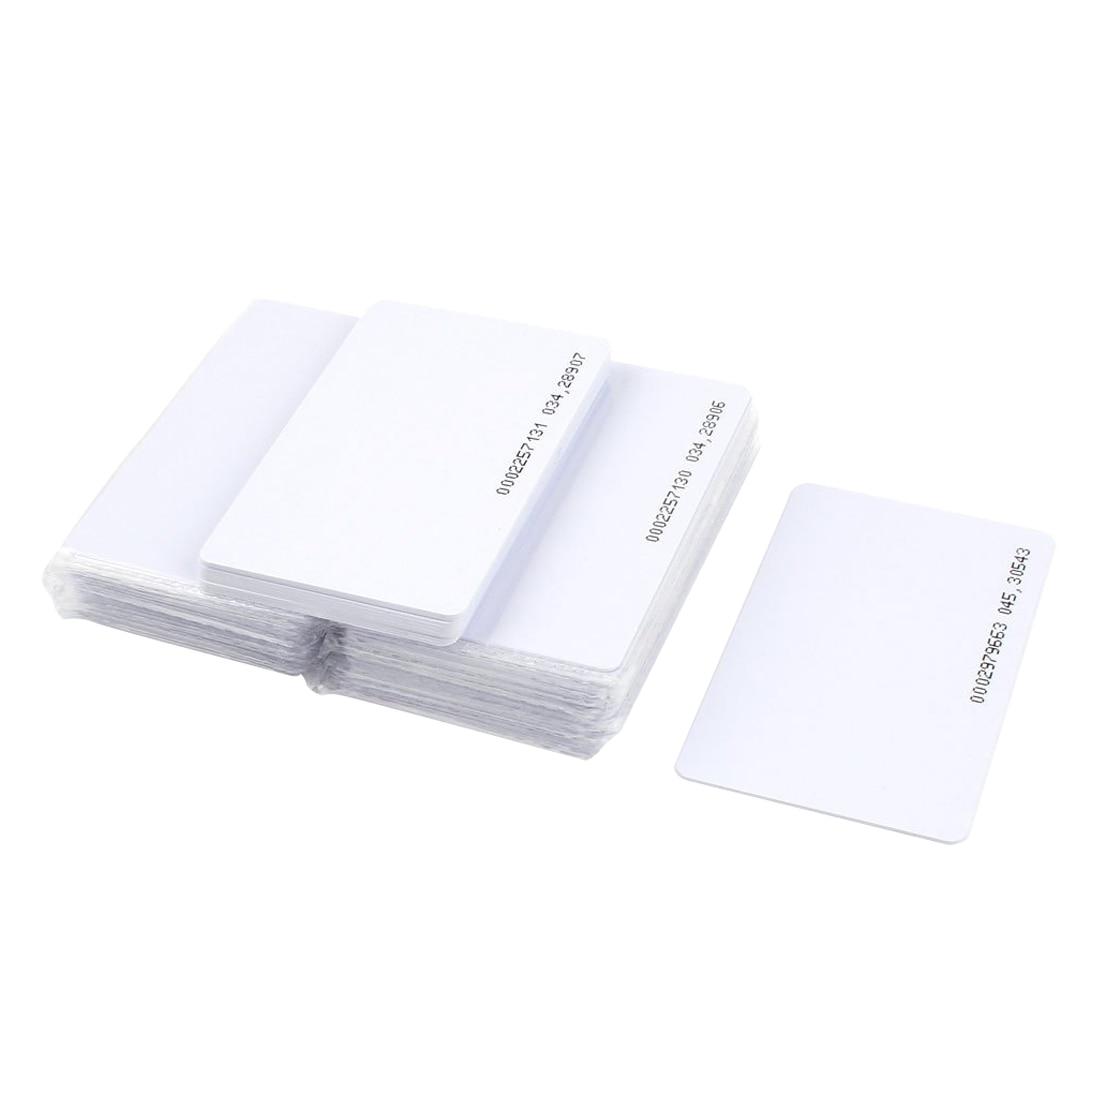 MOOL 50 pieces Intelligent Proximity EM4100 125kHz RFID Proximity Card Entry Empty ID Access turck proximity switch bi2 g12sk an6x